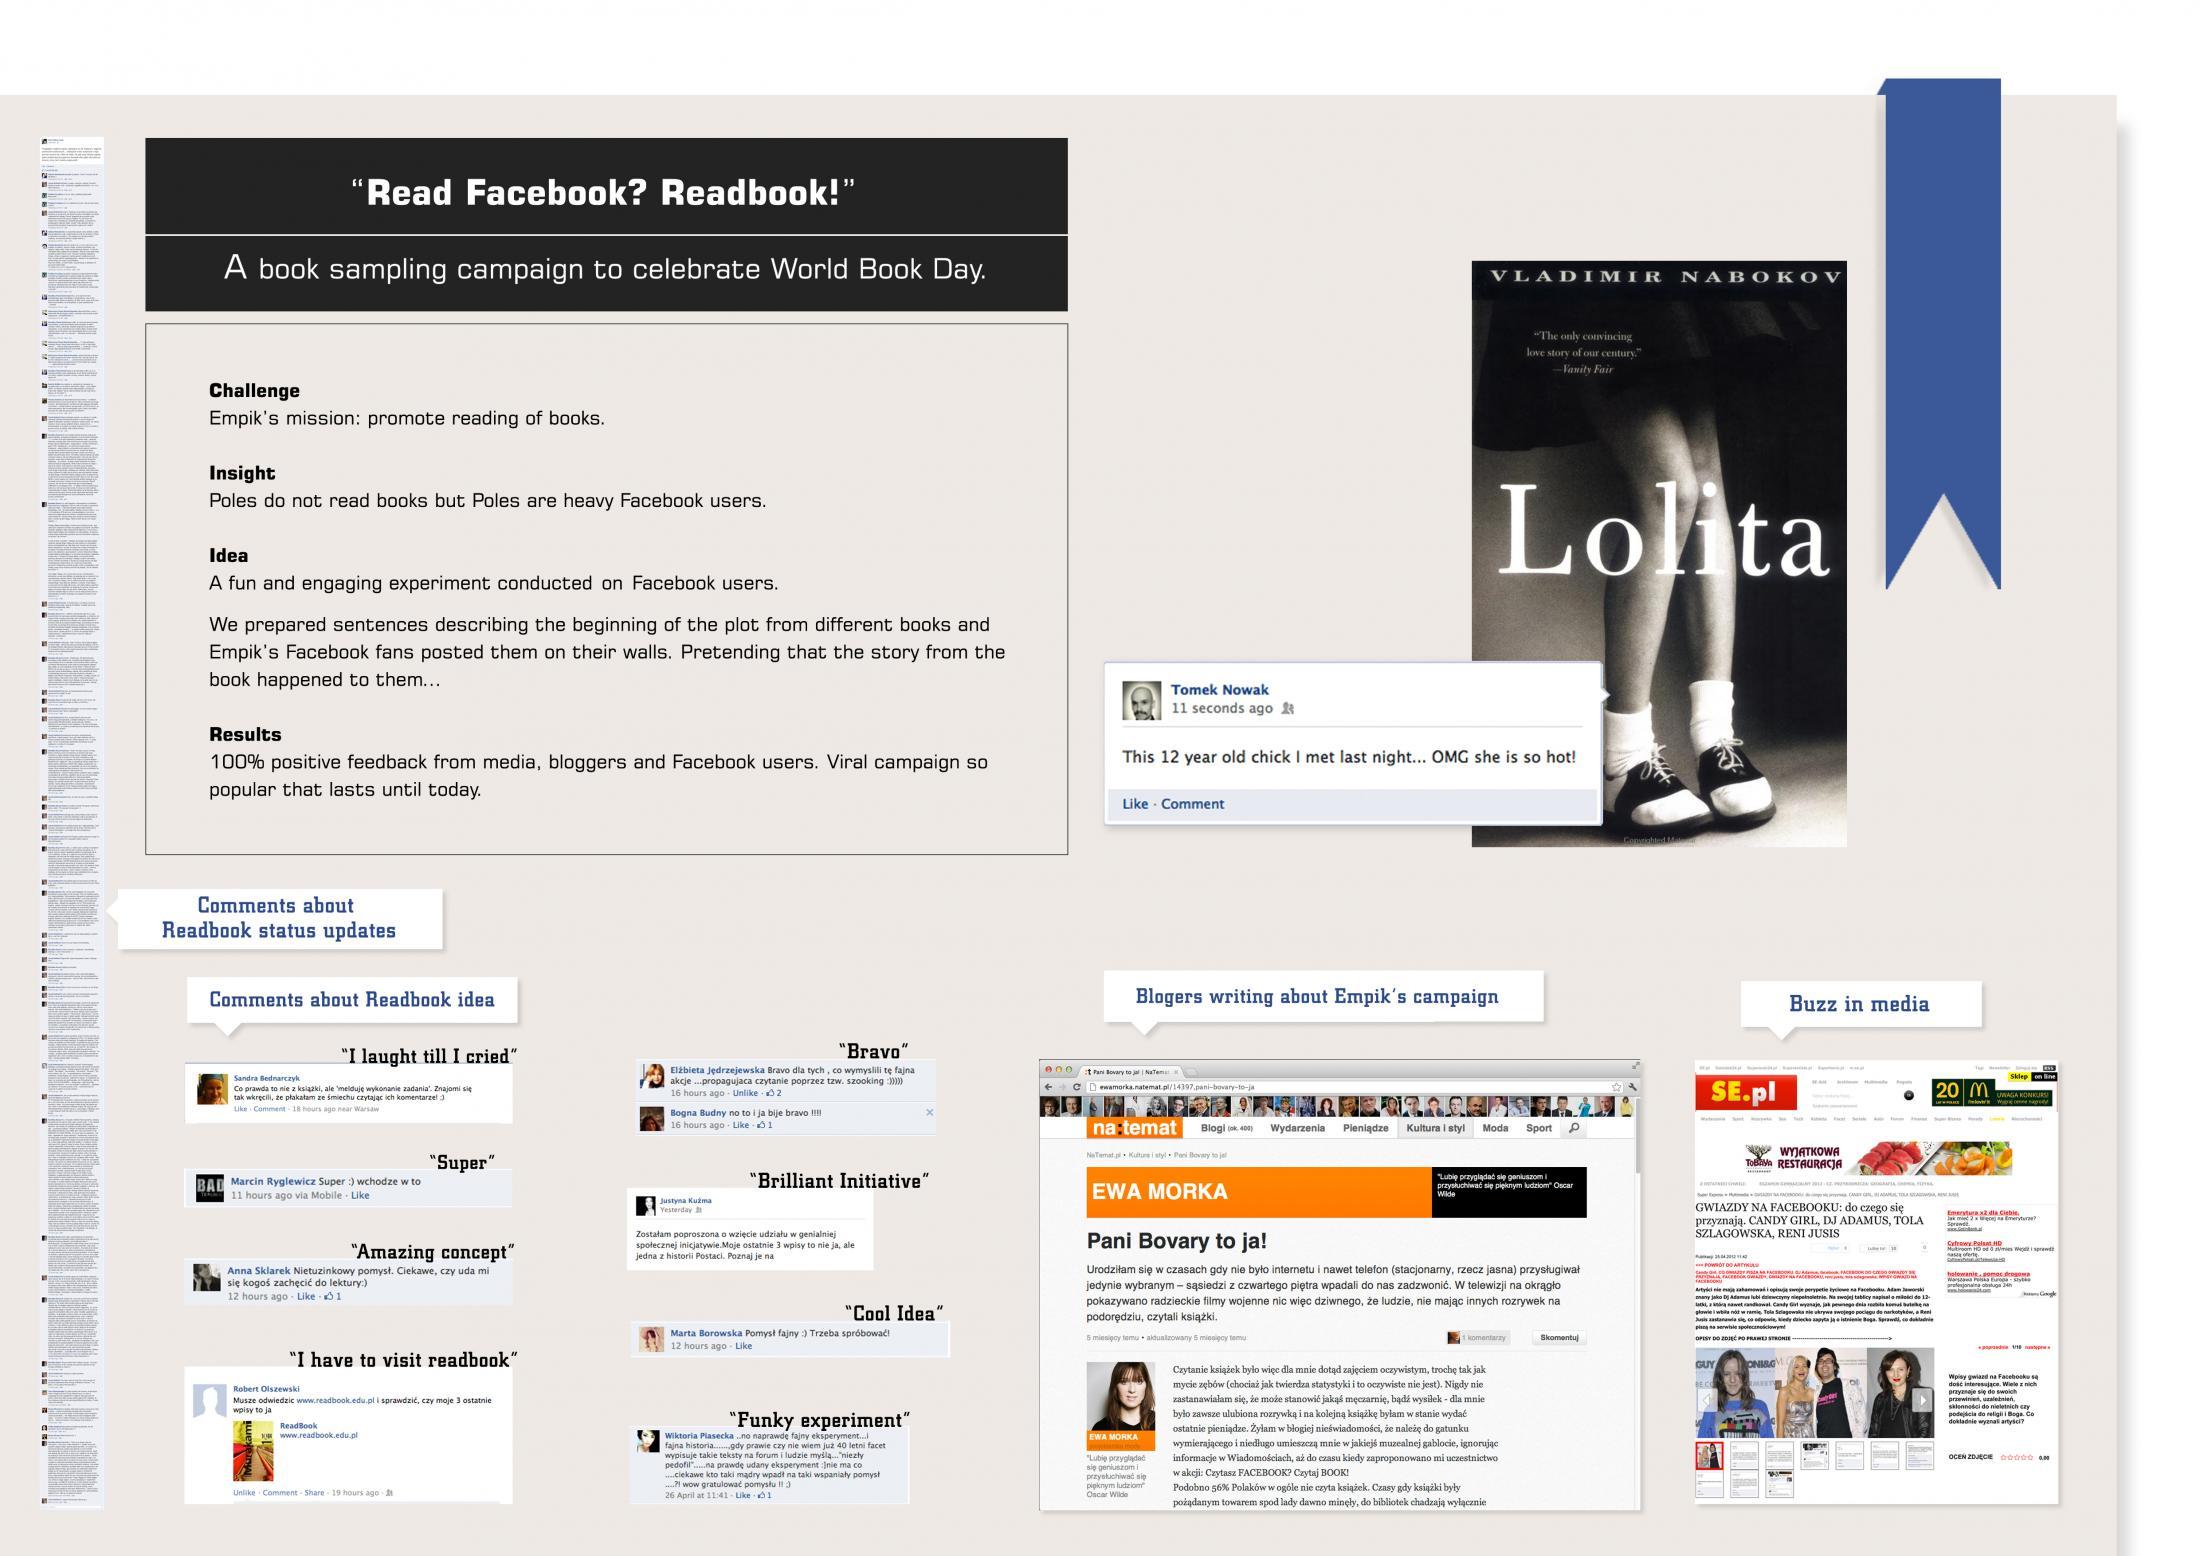 Thumbnail for Read Facebook? Readbook!